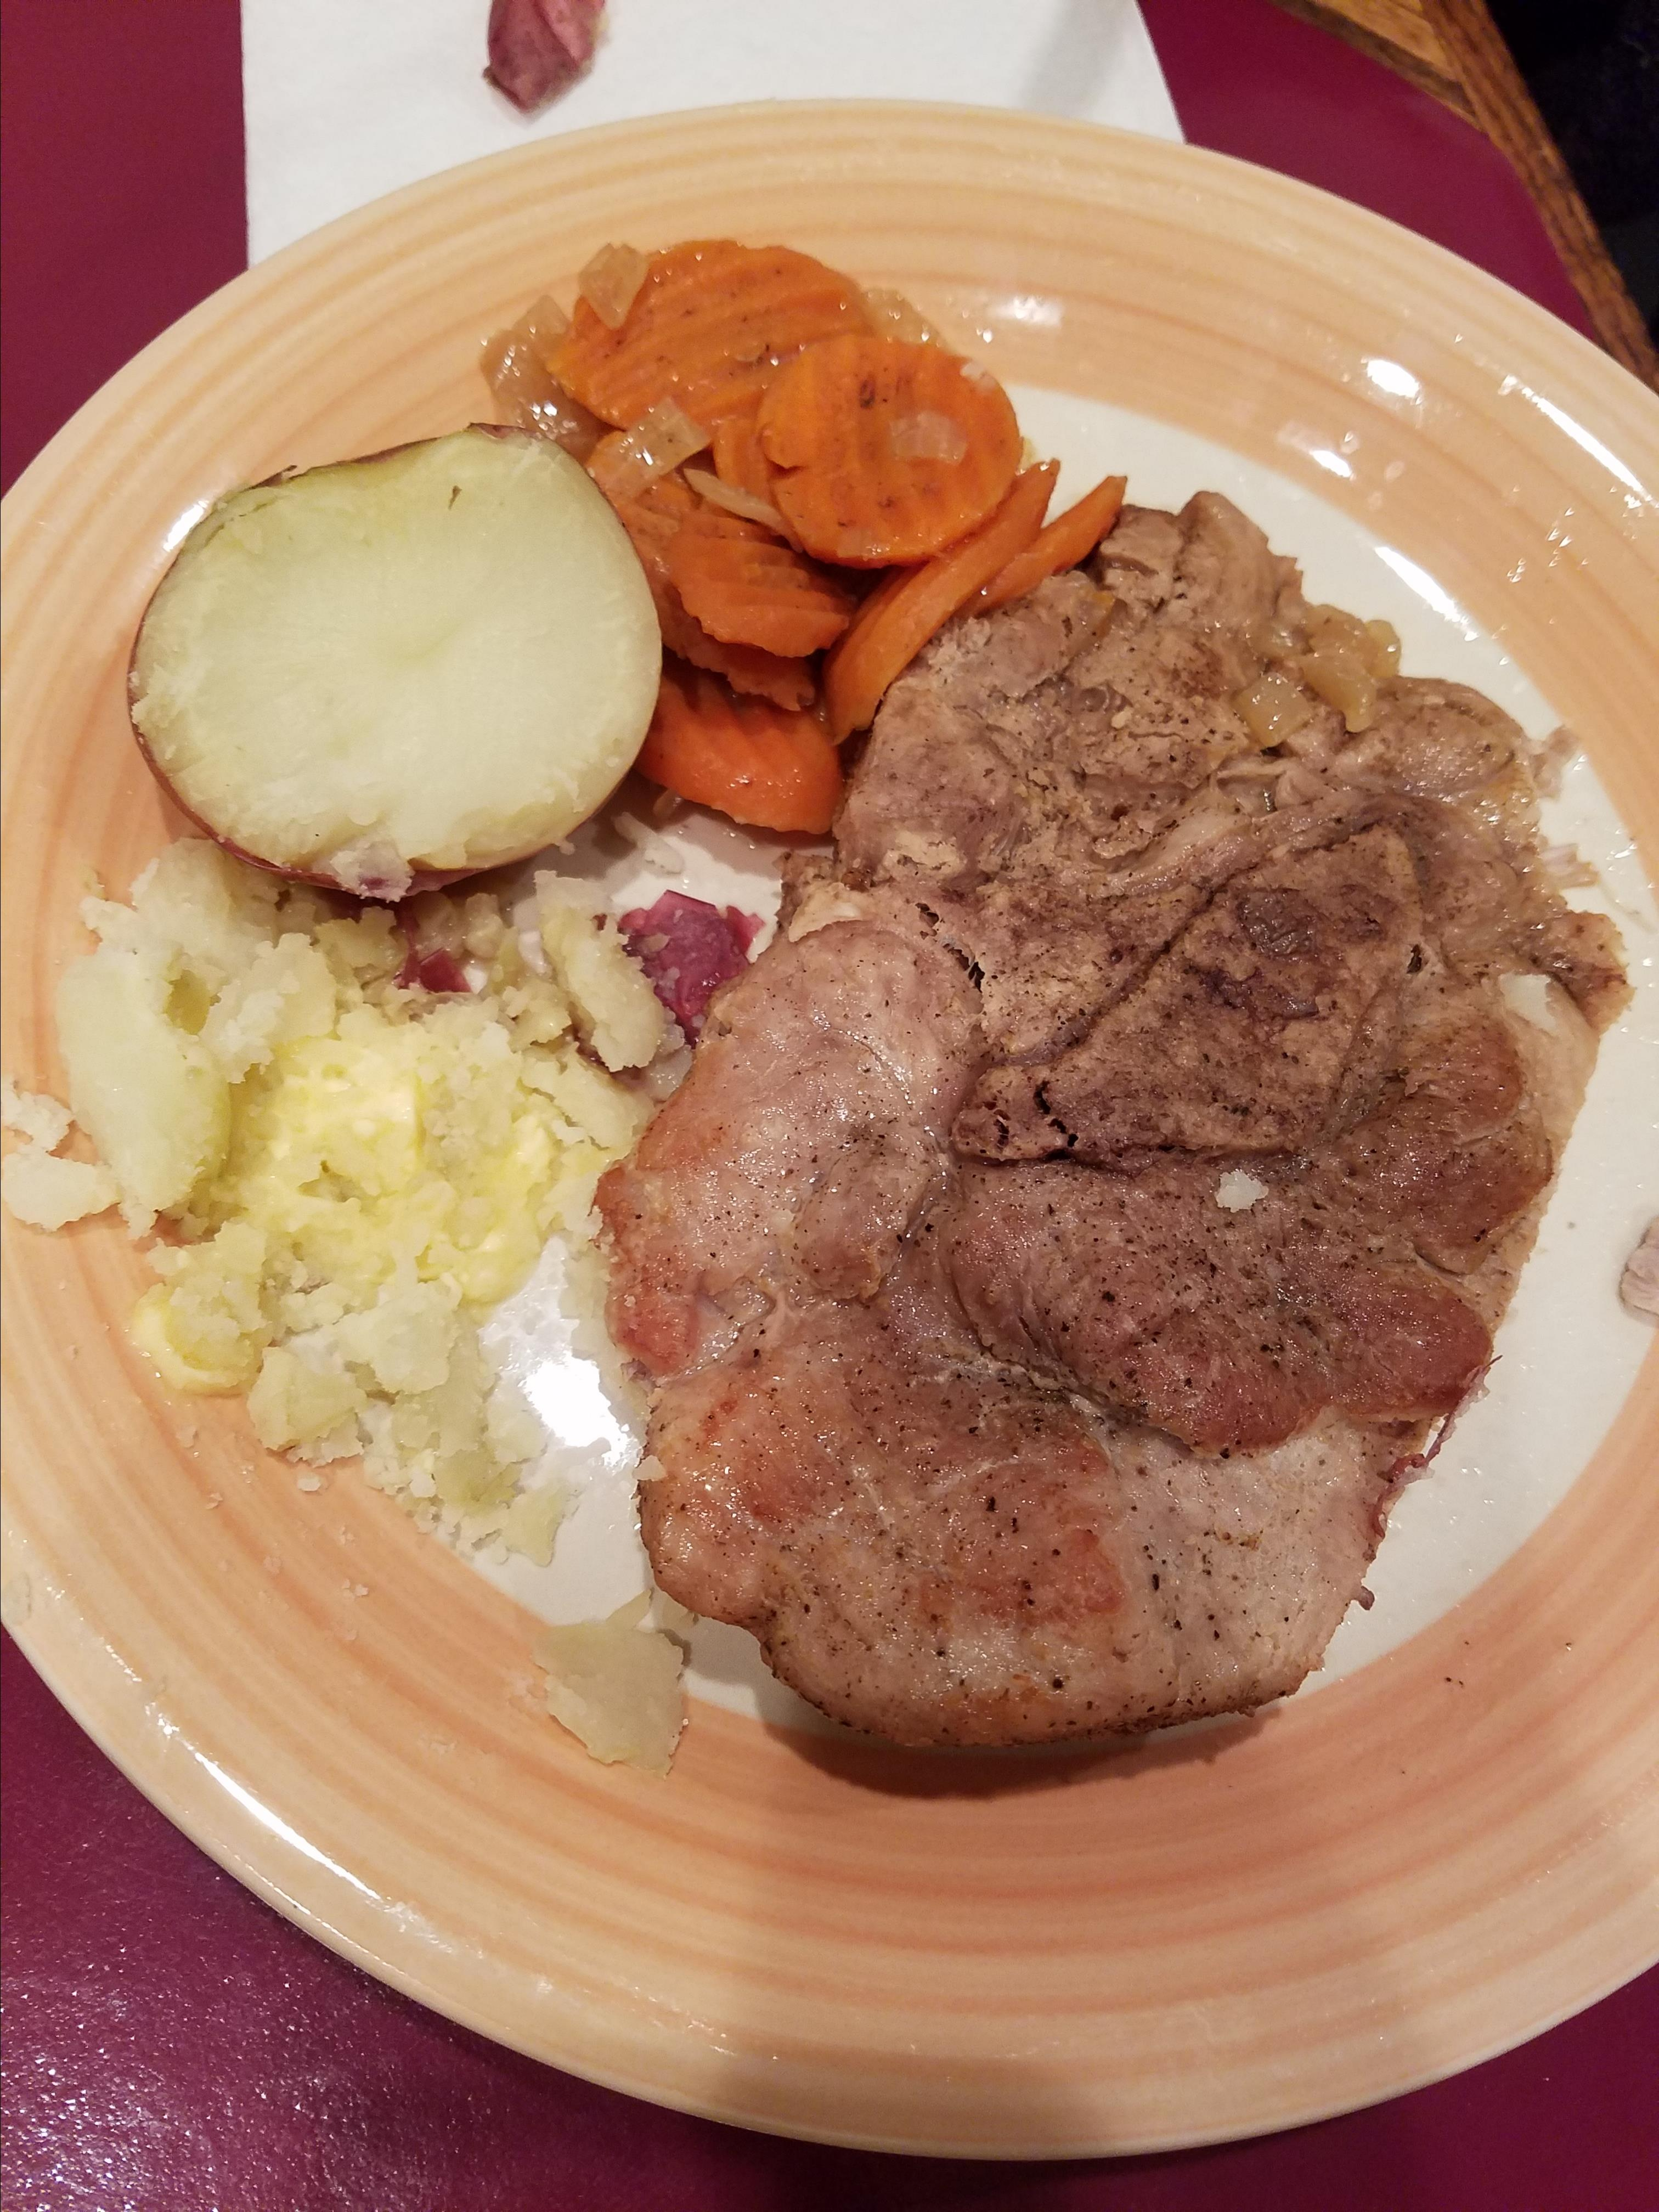 Pressure Cooker Bone-In Pork Chops, Baked Potatoes, and Carrots lori010993